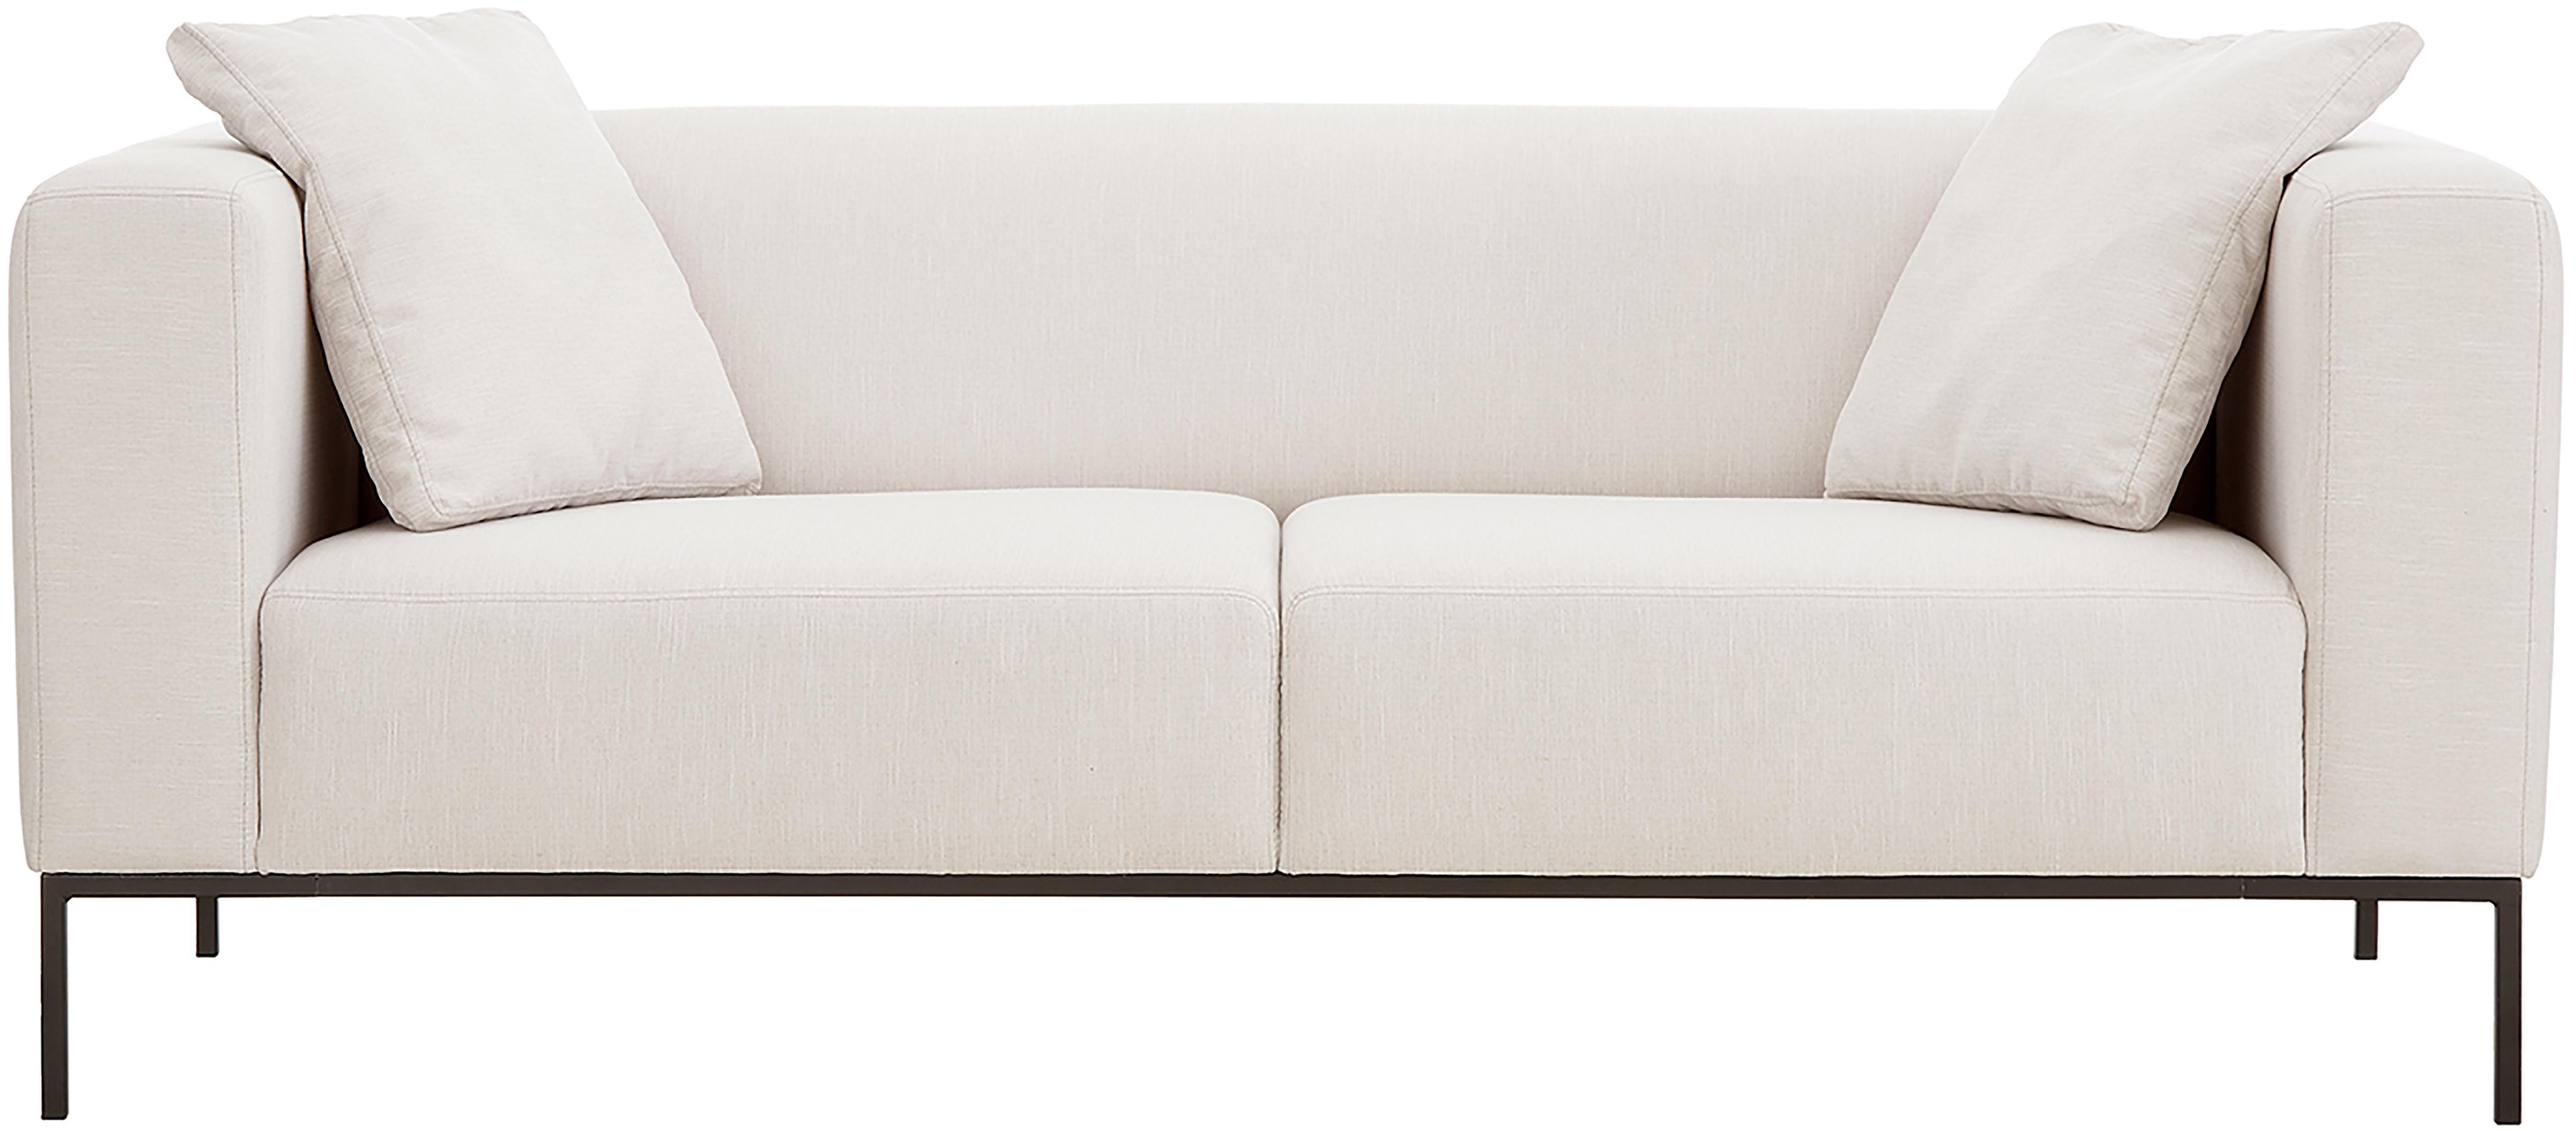 Bank Carrie (3-zits), Bekleding: polyester, Frame: spaanplaat, hardboard, mu, Poten: gelakt metaal, Geweven stof beige, B 202 x D 86 cm